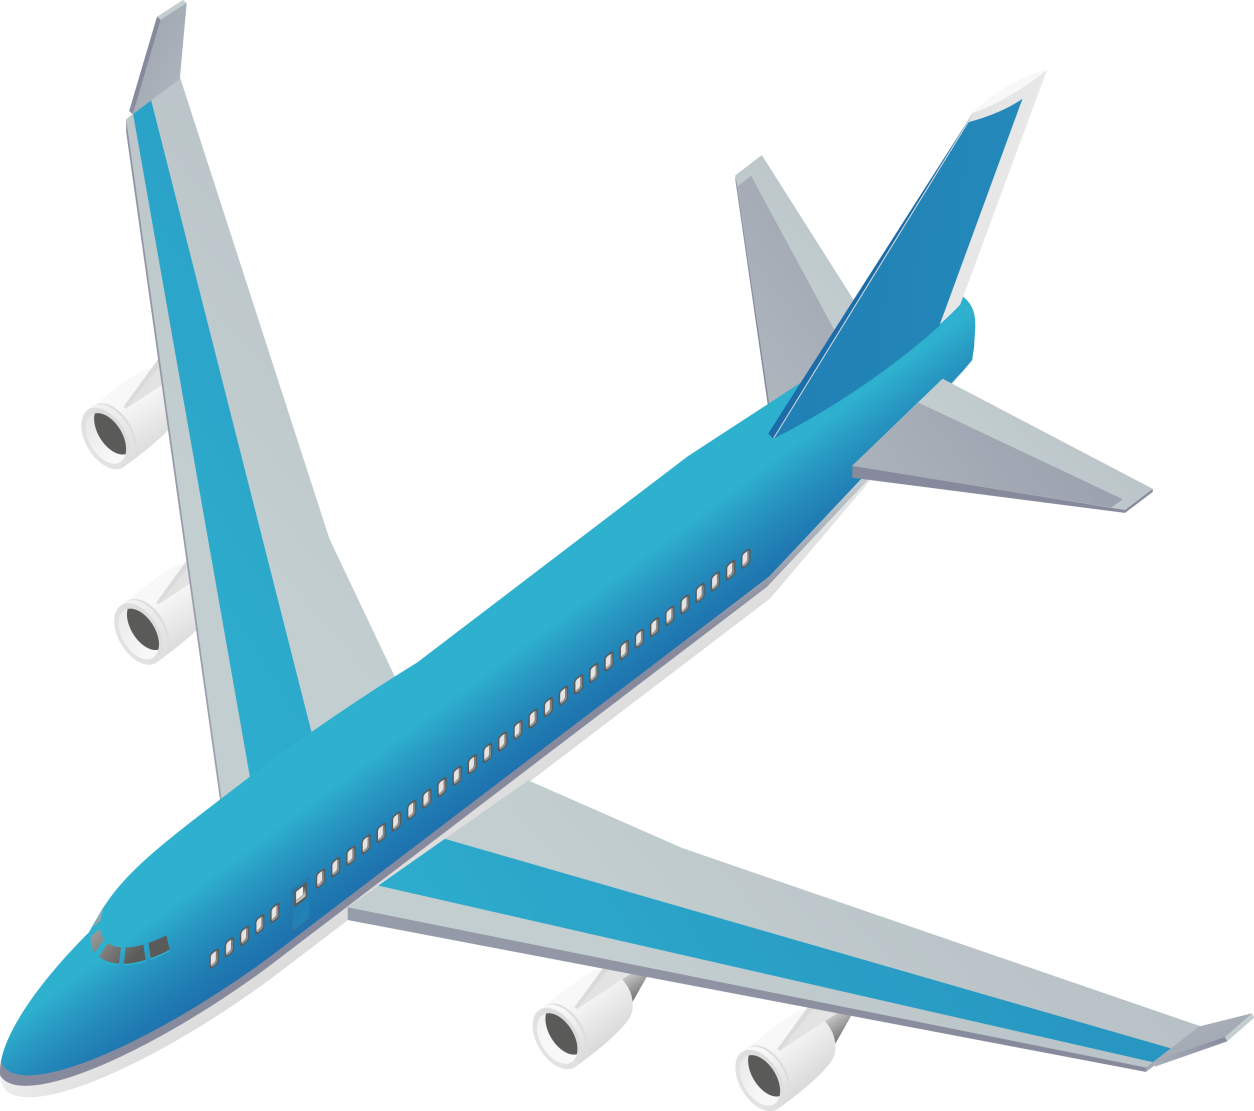 C:\Users\BOSS\Desktop\ФОТО ВАЖНО\airplane15.png